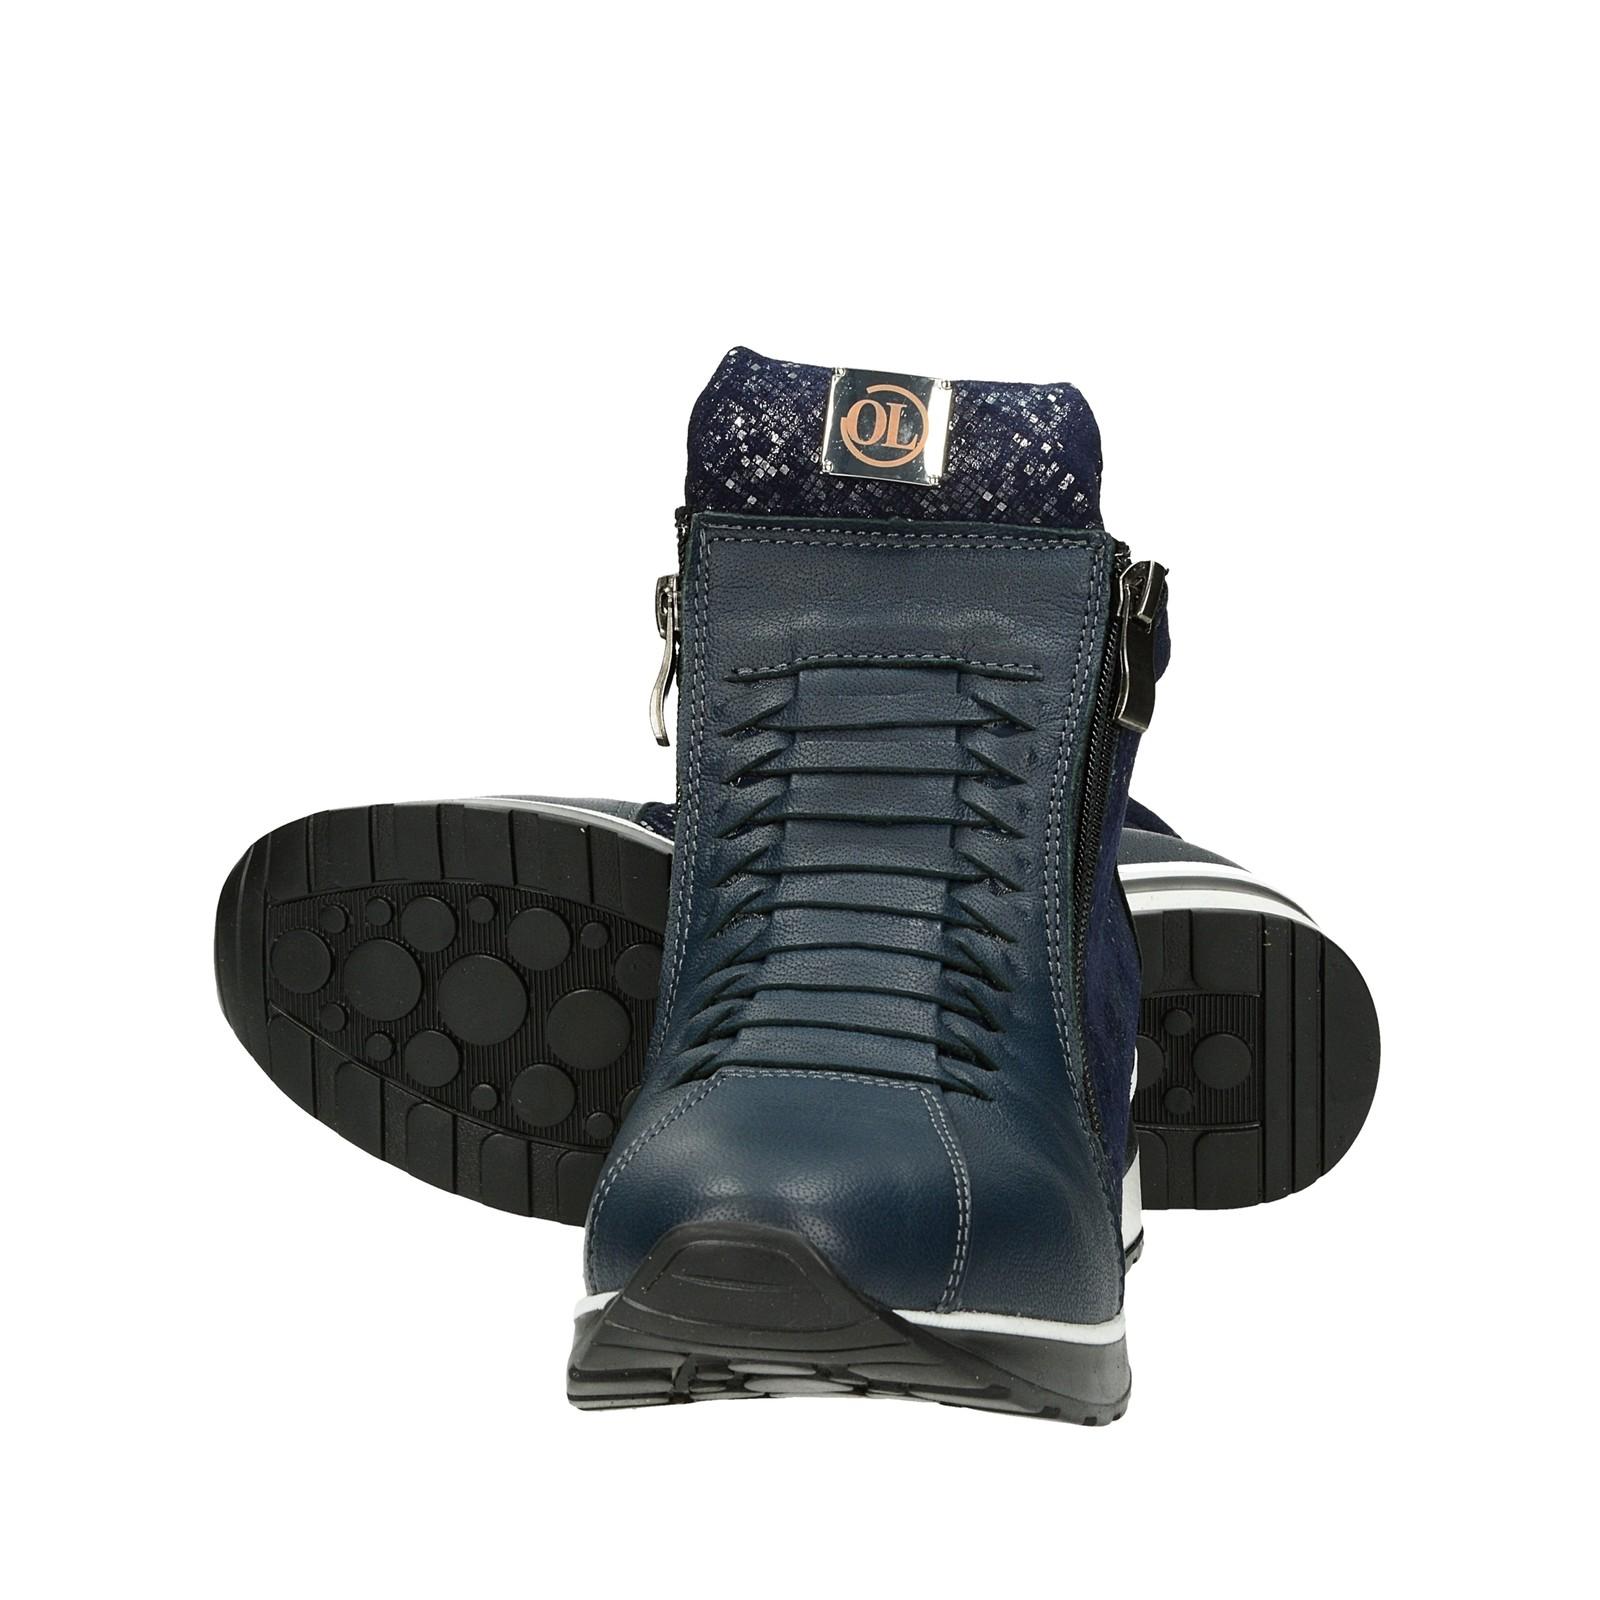 7a9ae998d26 Olivia shoes dámske kožené štýlové kotníky - modré ...